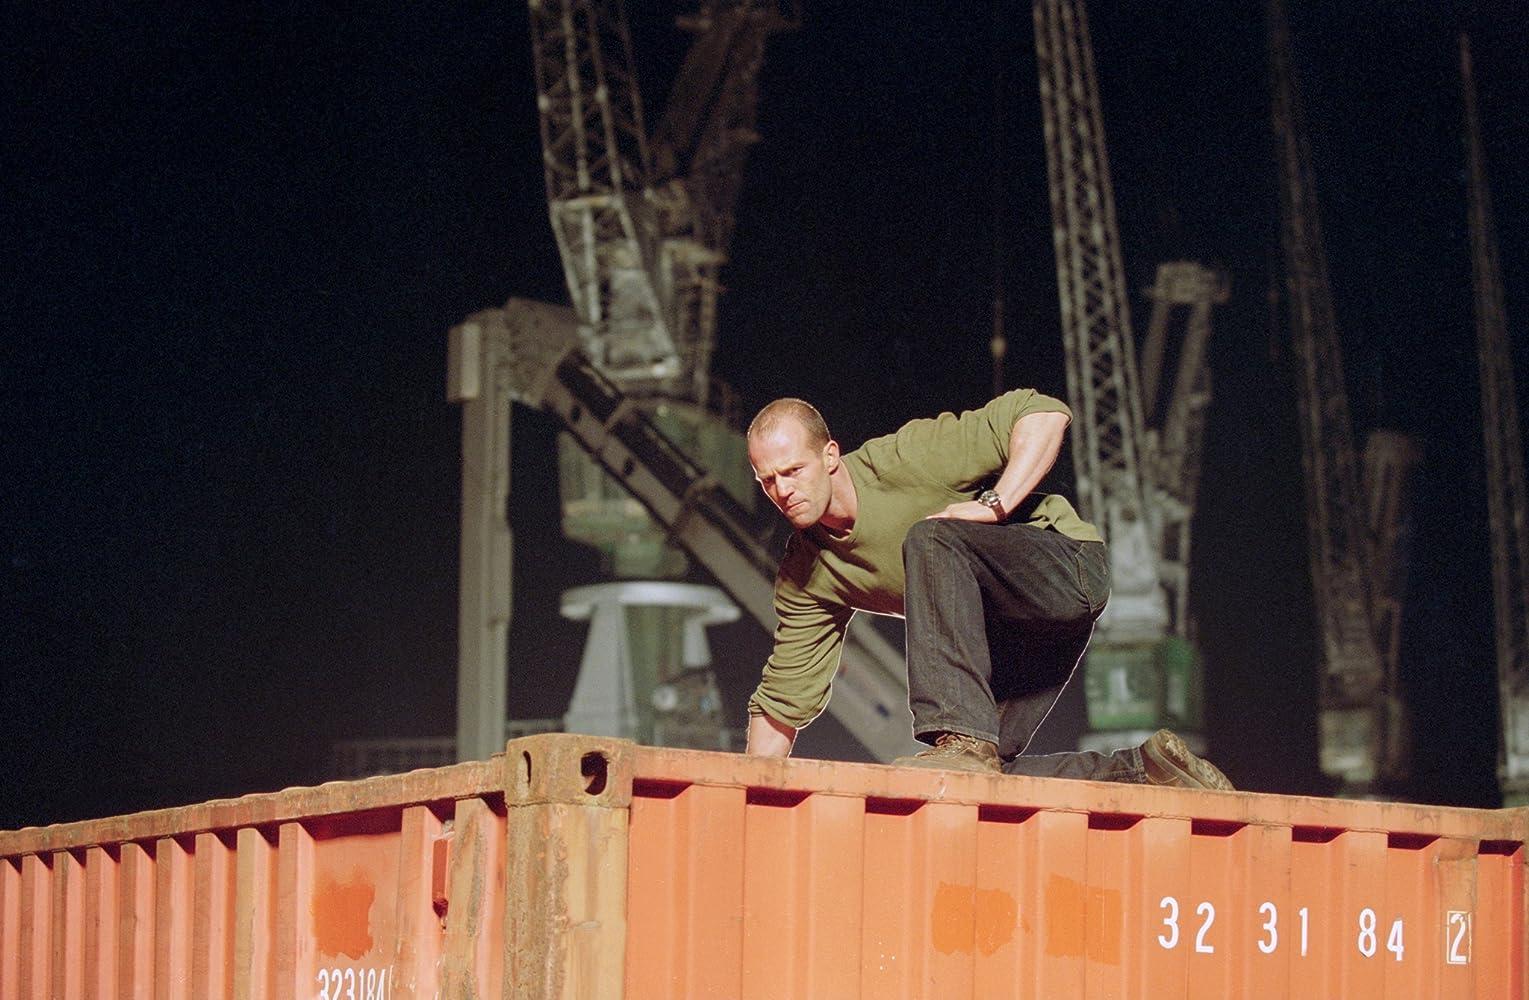 Jason Statham in The Transporter (2002)